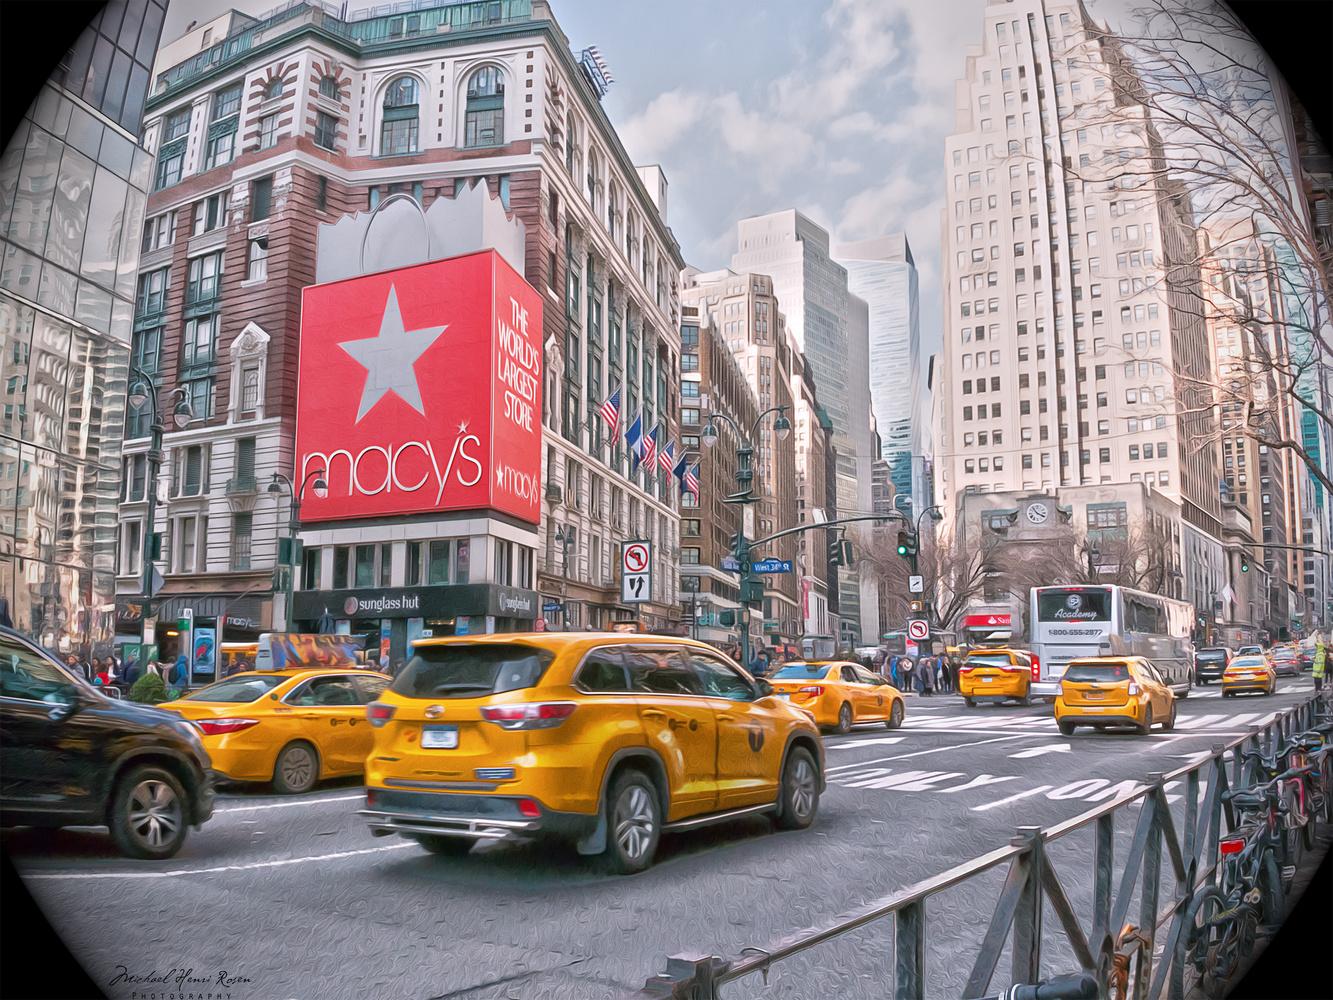 Slice of New York by Michael Rosen